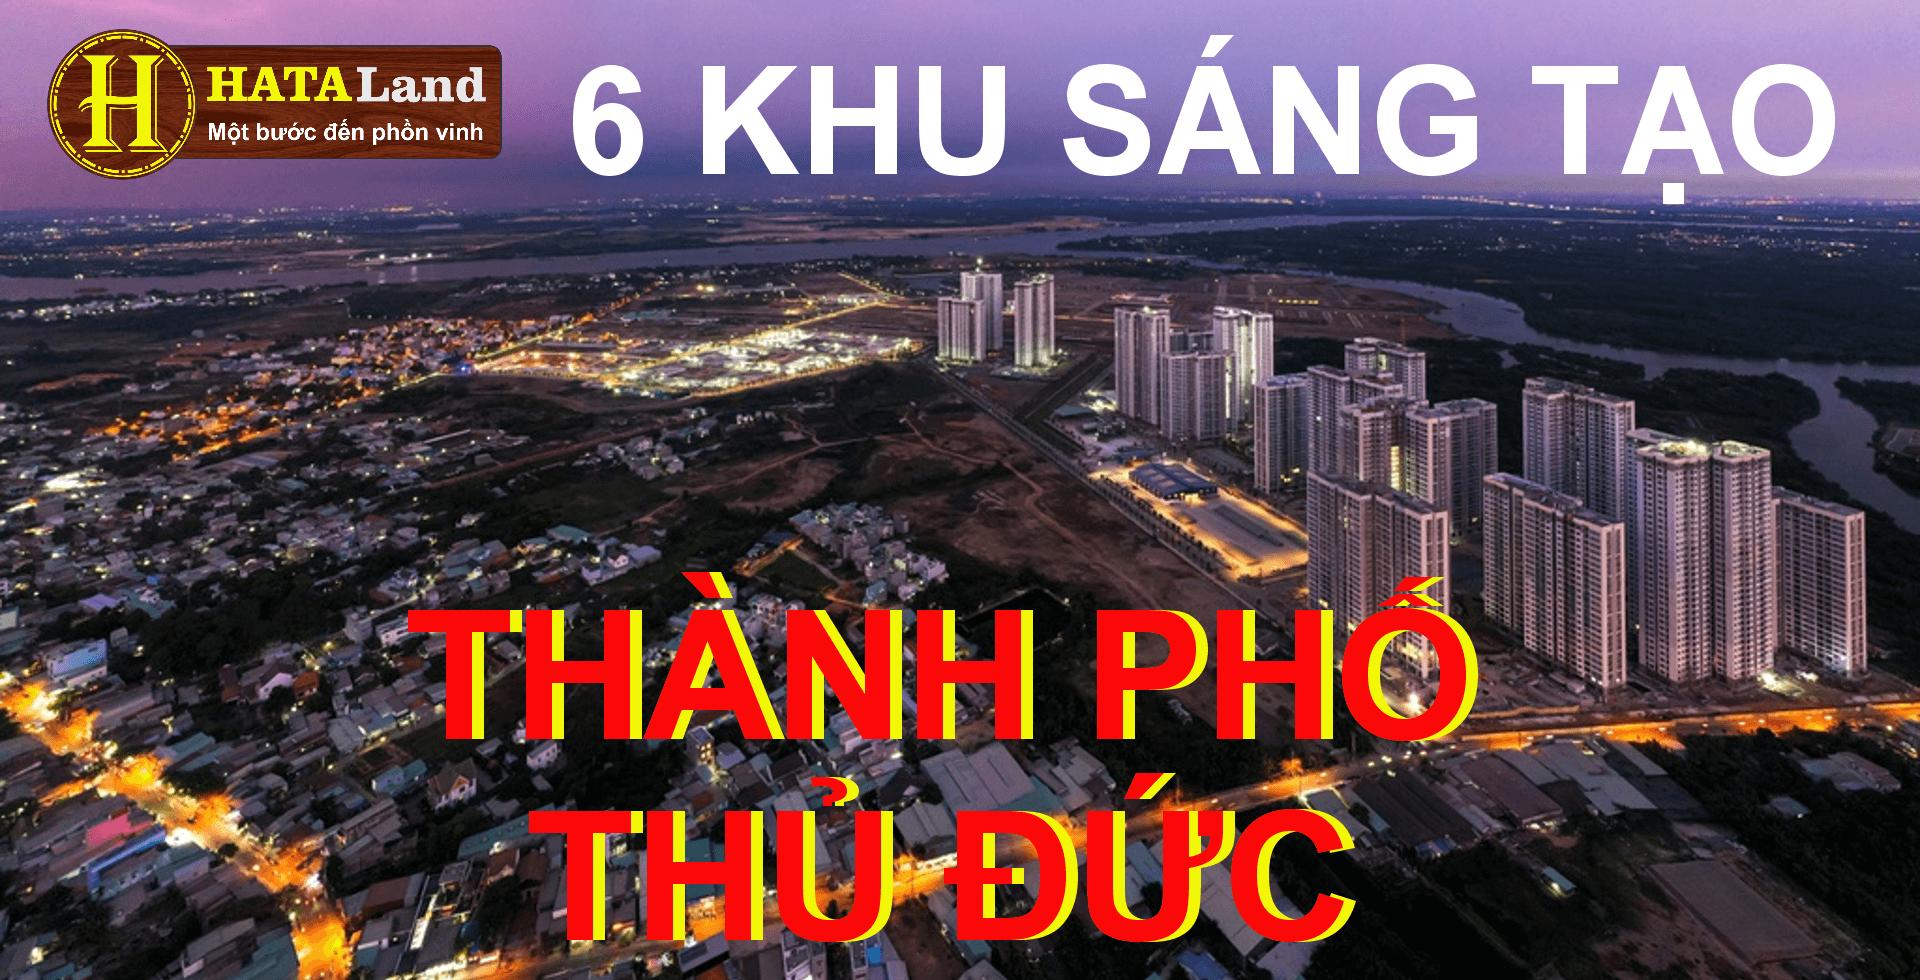 KHU-DO-THI-SANG-TAO-THONG-MINH-THANH-PHO-THU-DUC-TUONG-LAI